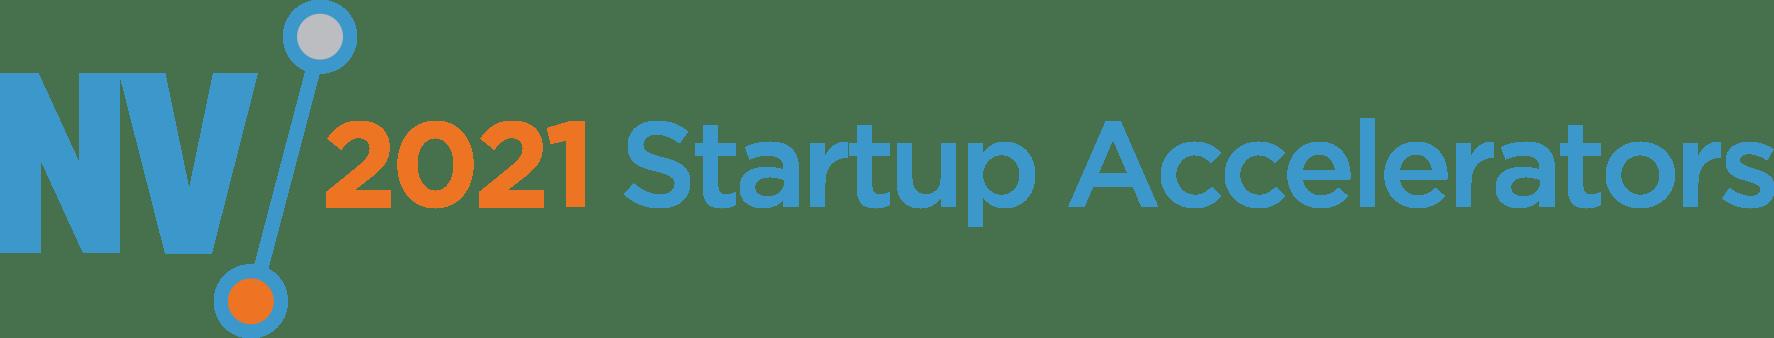 New Ventures Startup Accelerators logo